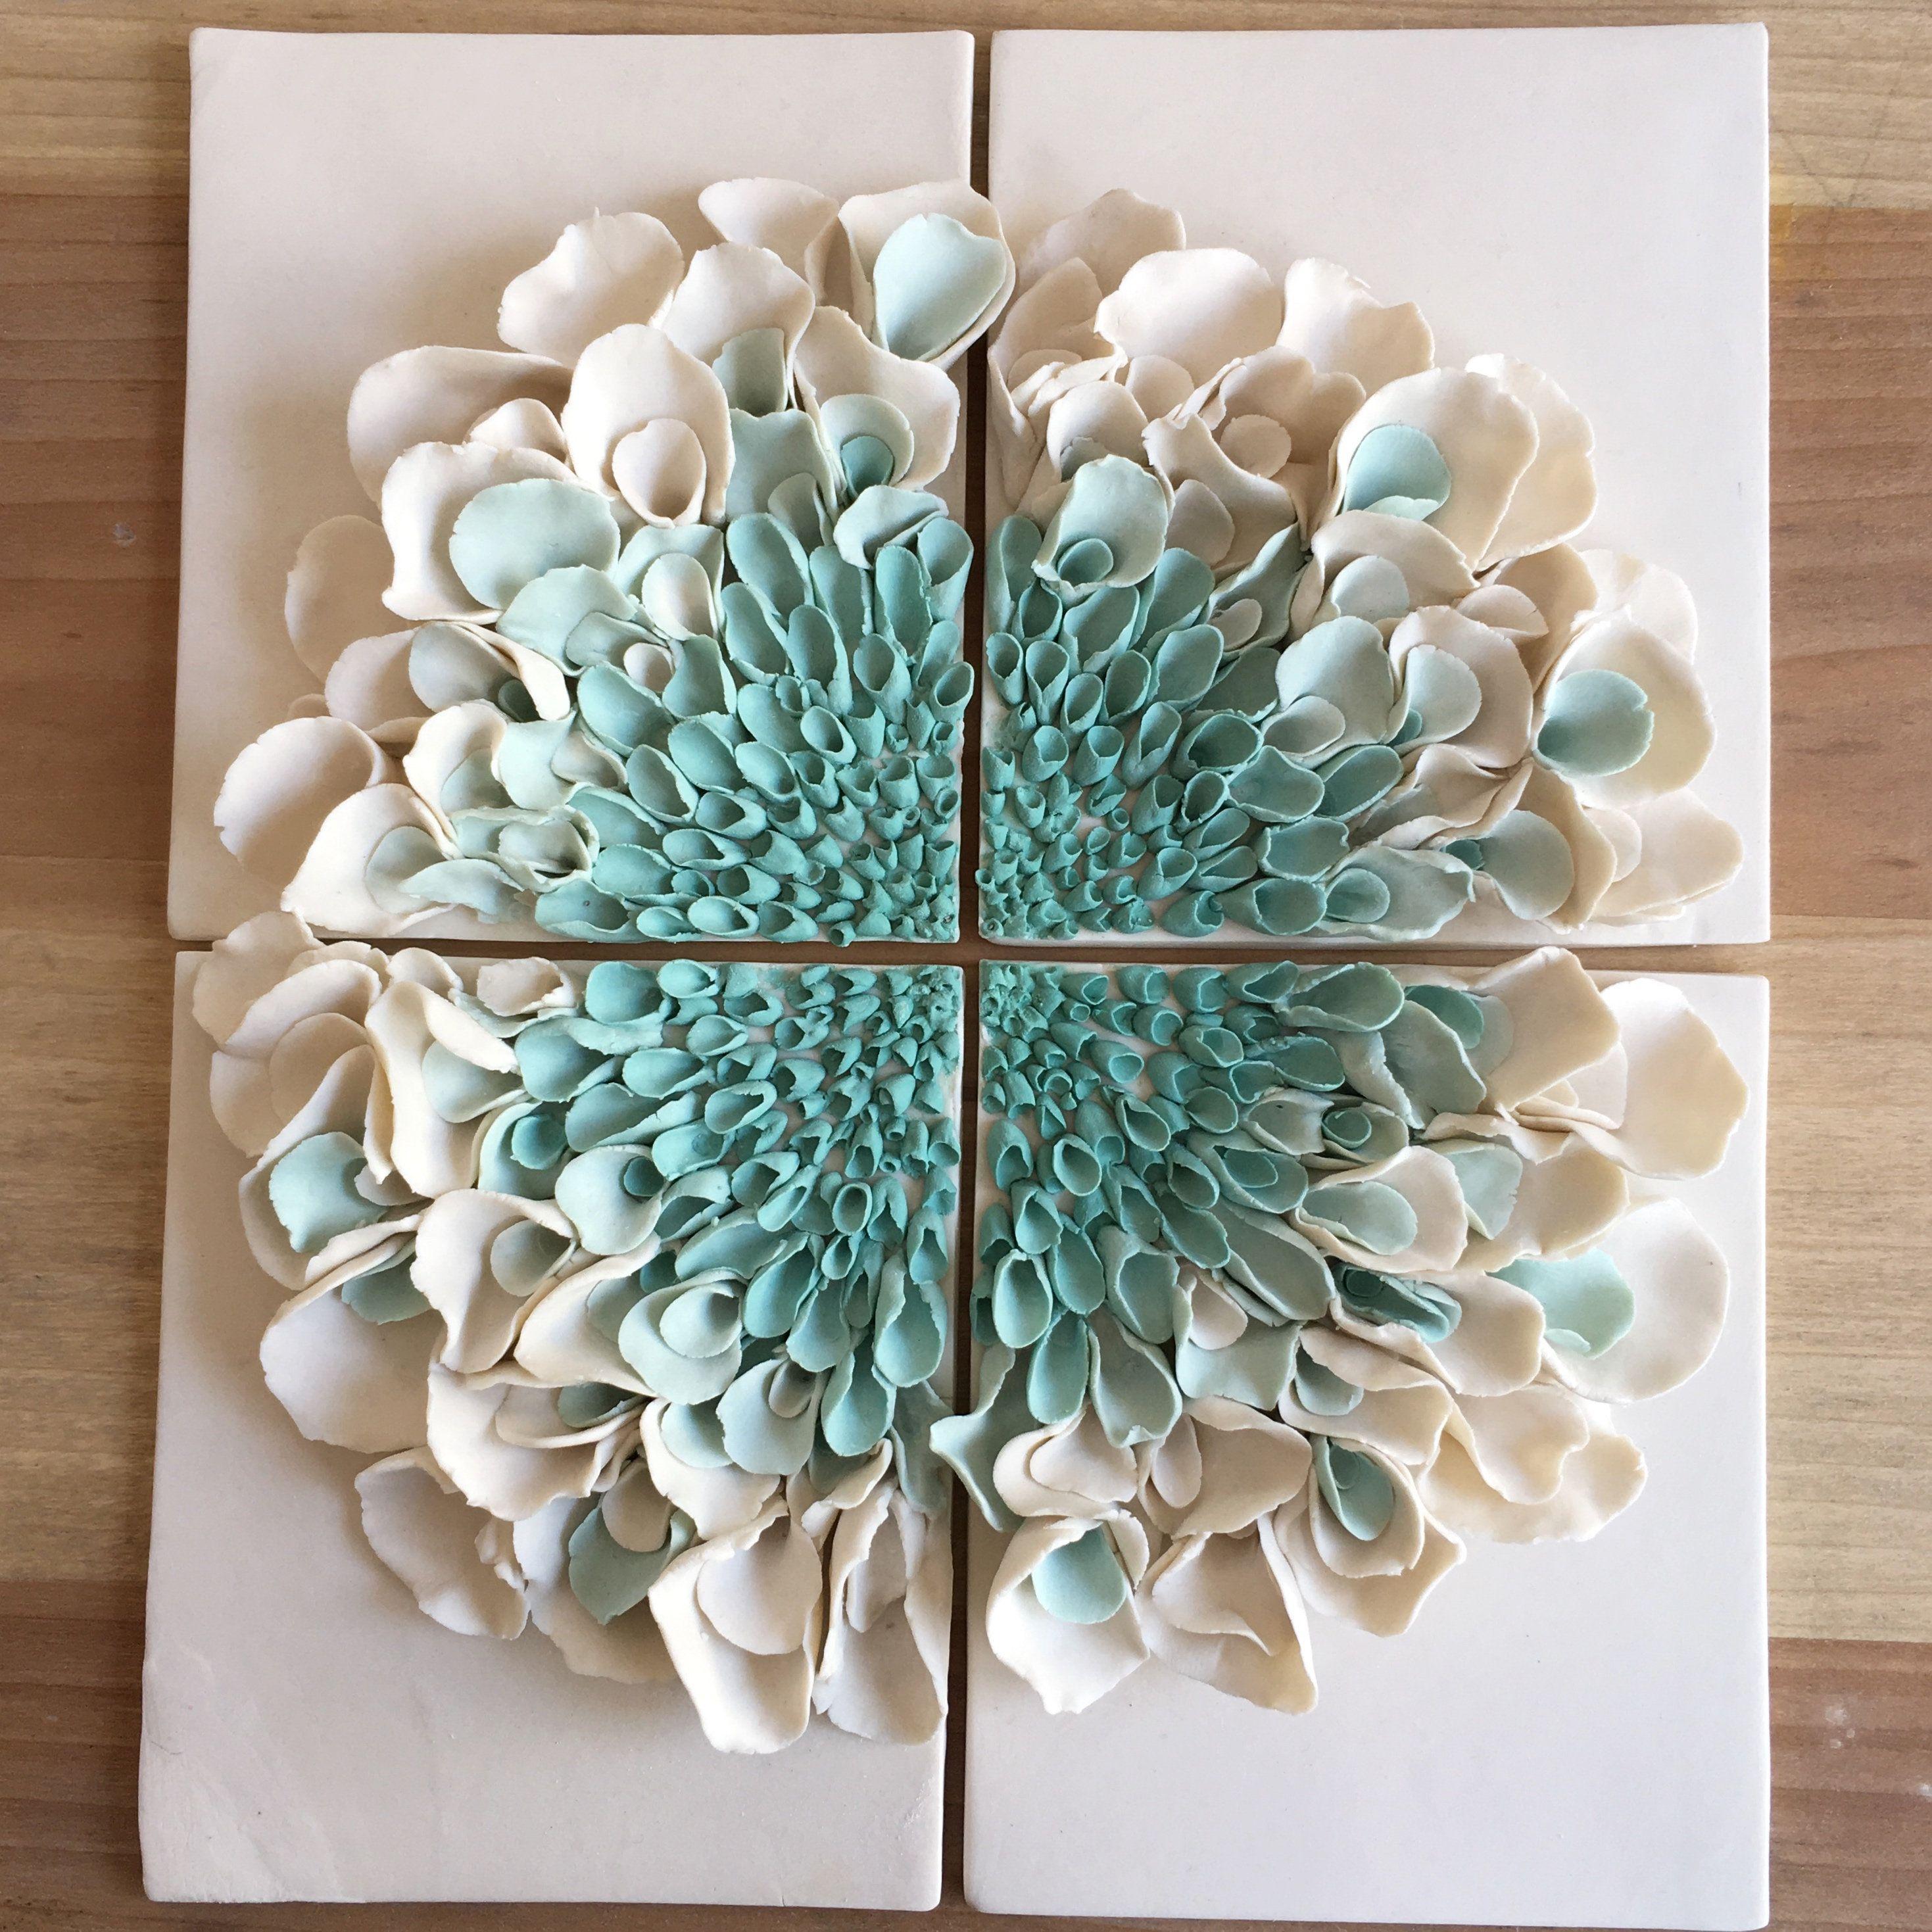 Ceramic Flower Wall Decor Porcelain